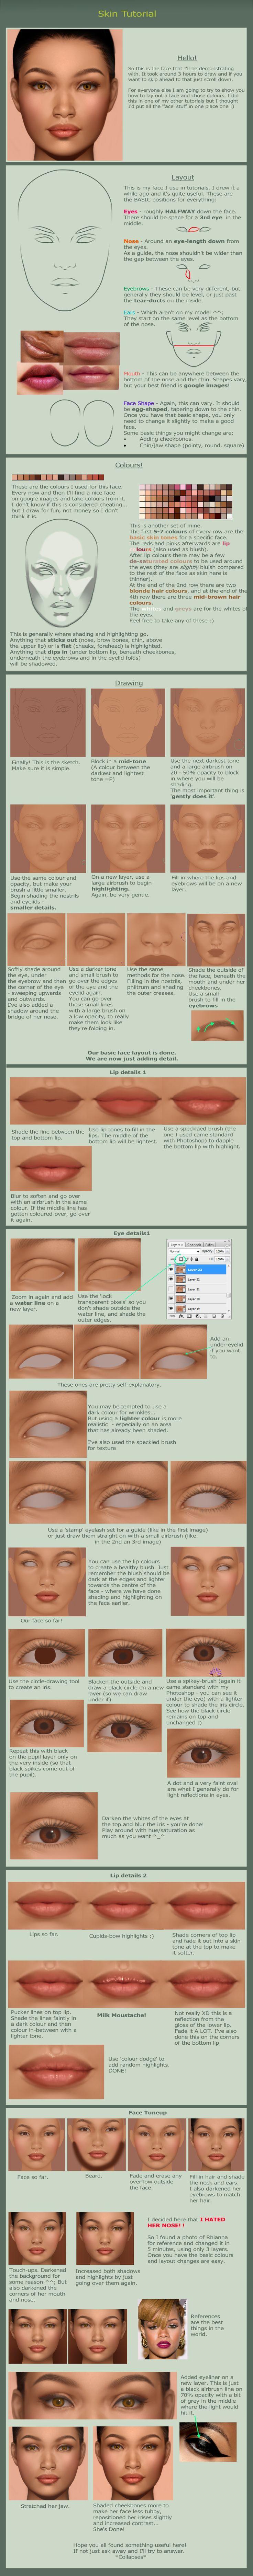 Massive Face Tutorial by ~gothic-icecream on deviantART, Resources for Art Students / Art School Portfolio Work at CAPI ::: Create Art Portfolio Ideas at milliande.com , How to Draw Faces